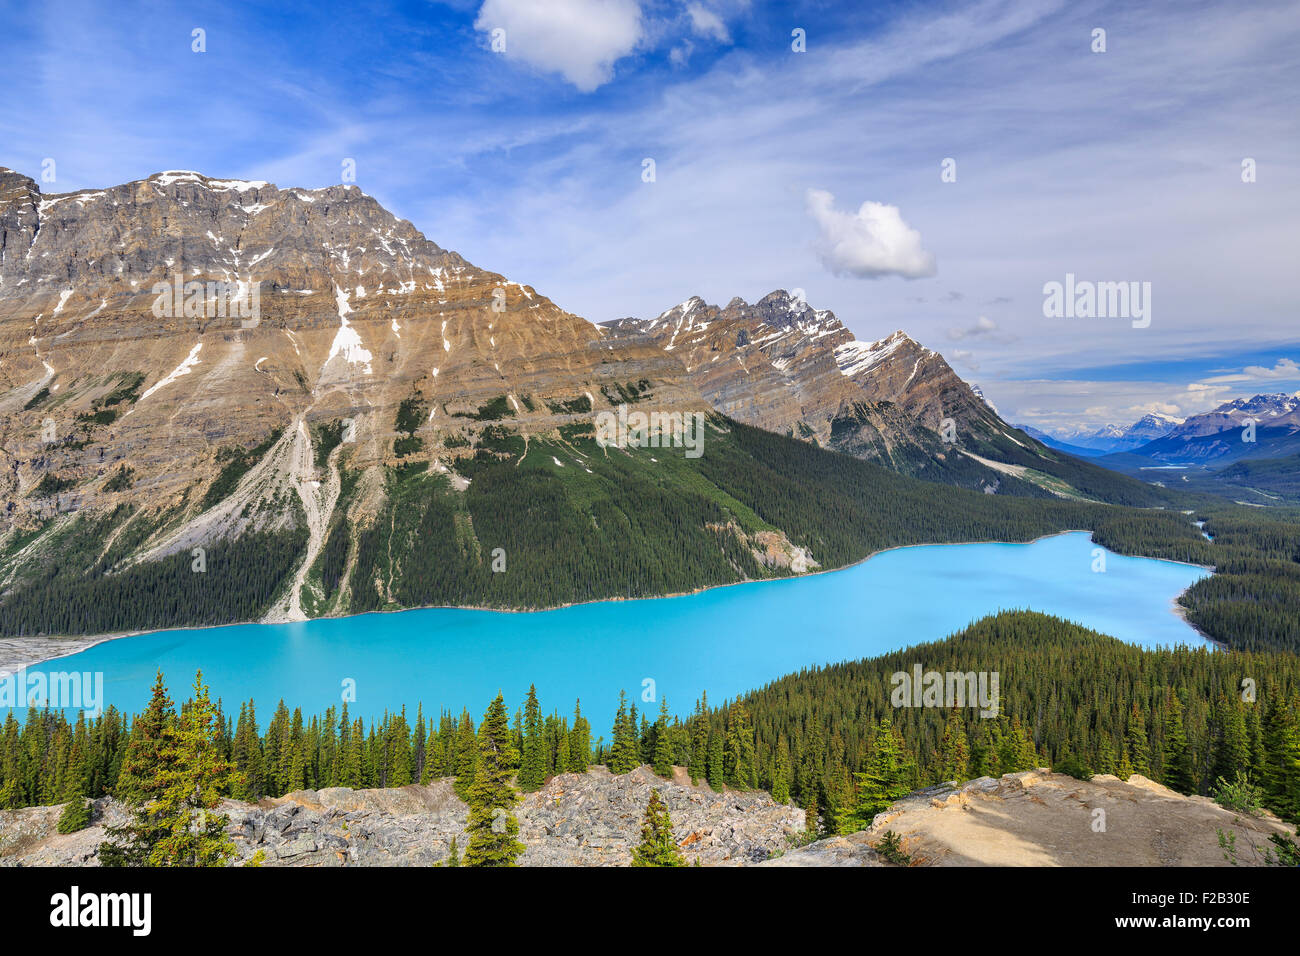 Peyto Lake, Banff Nationalpark, Alberta, Kanada. Stockbild